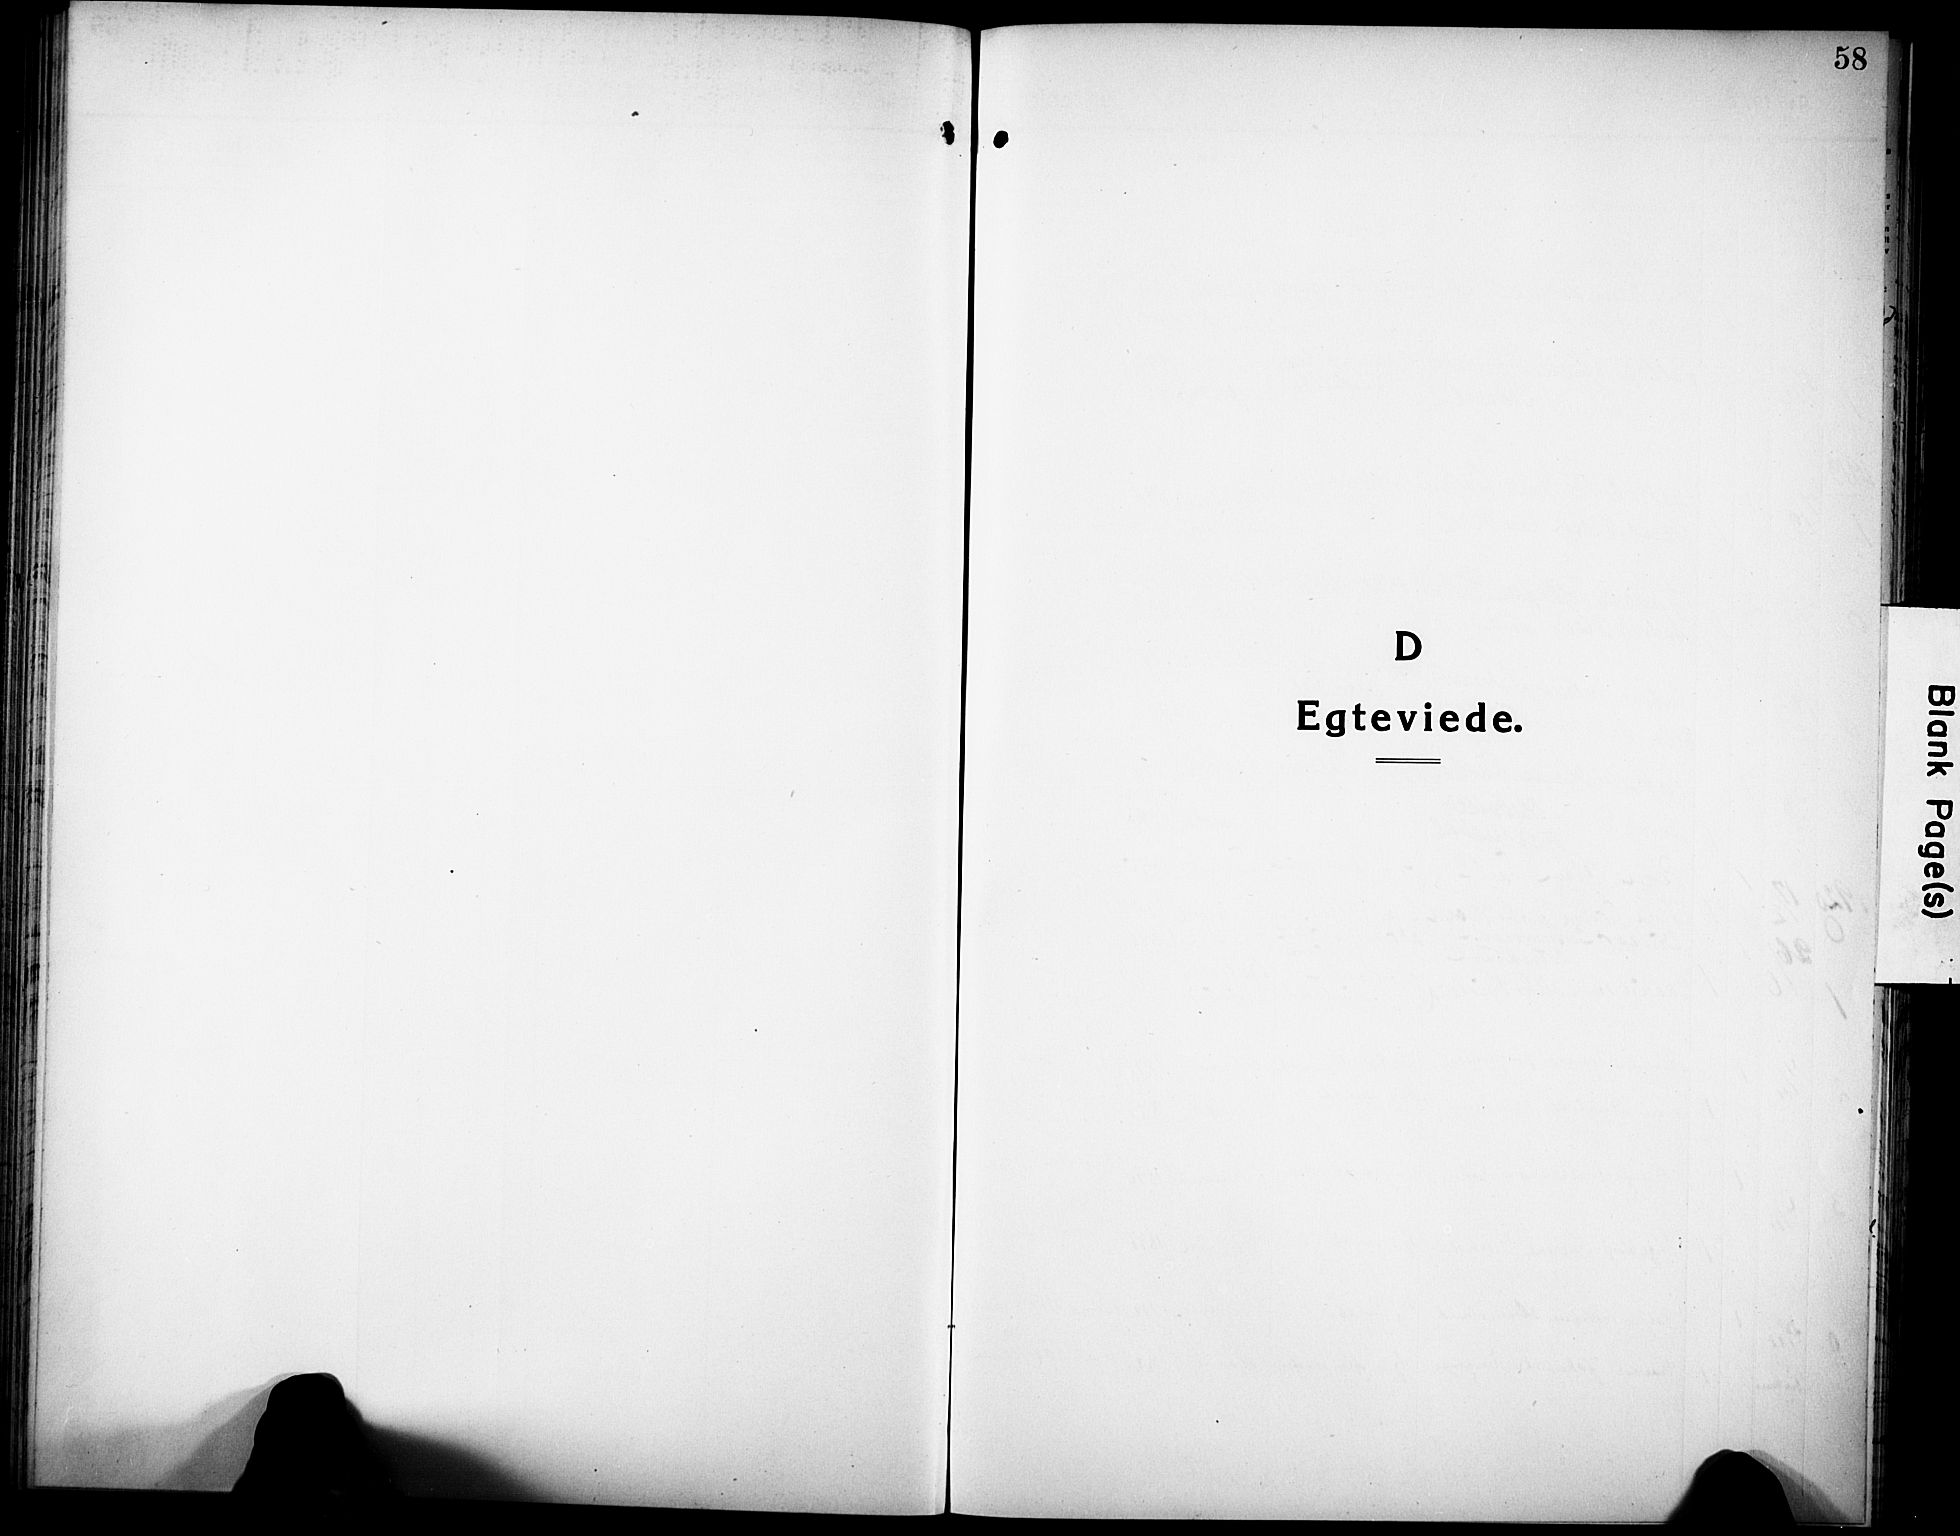 SAK, Herefoss sokneprestkontor, F/Fb/Fbb/L0004: Klokkerbok nr. B 4, 1917-1933, s. 52